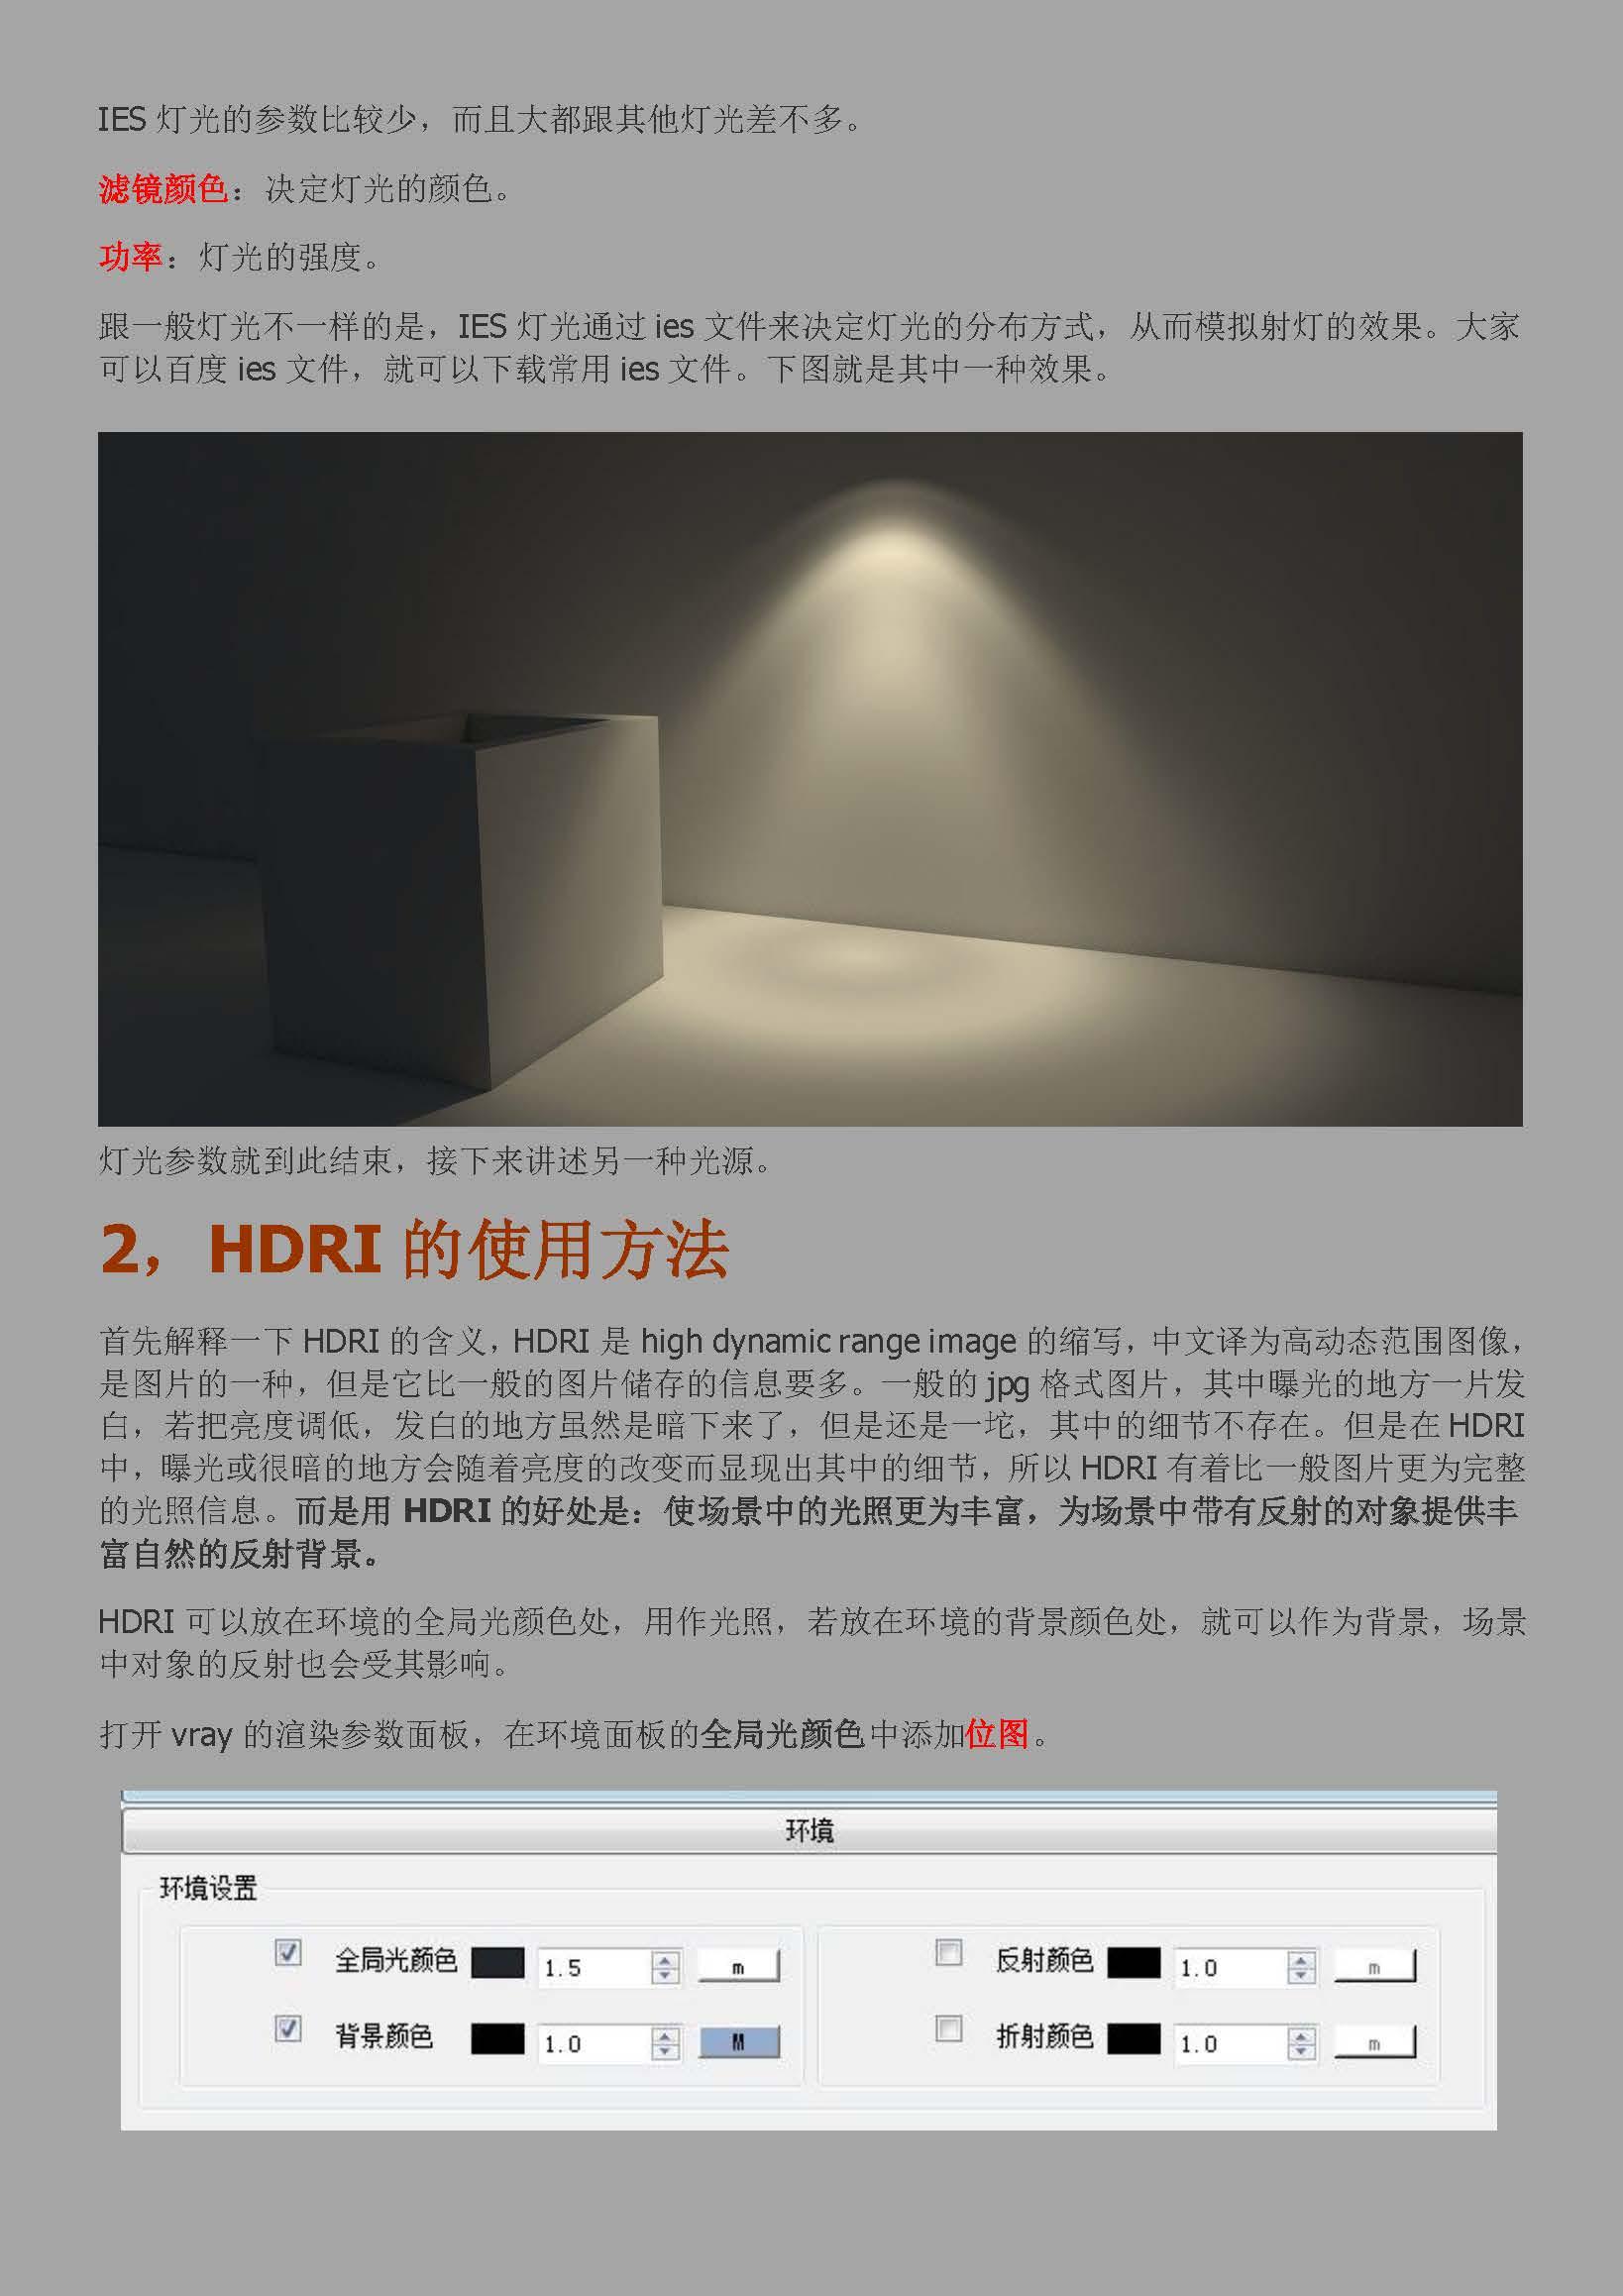 http://img.zhux2.com/editor1588920605694460.jpg